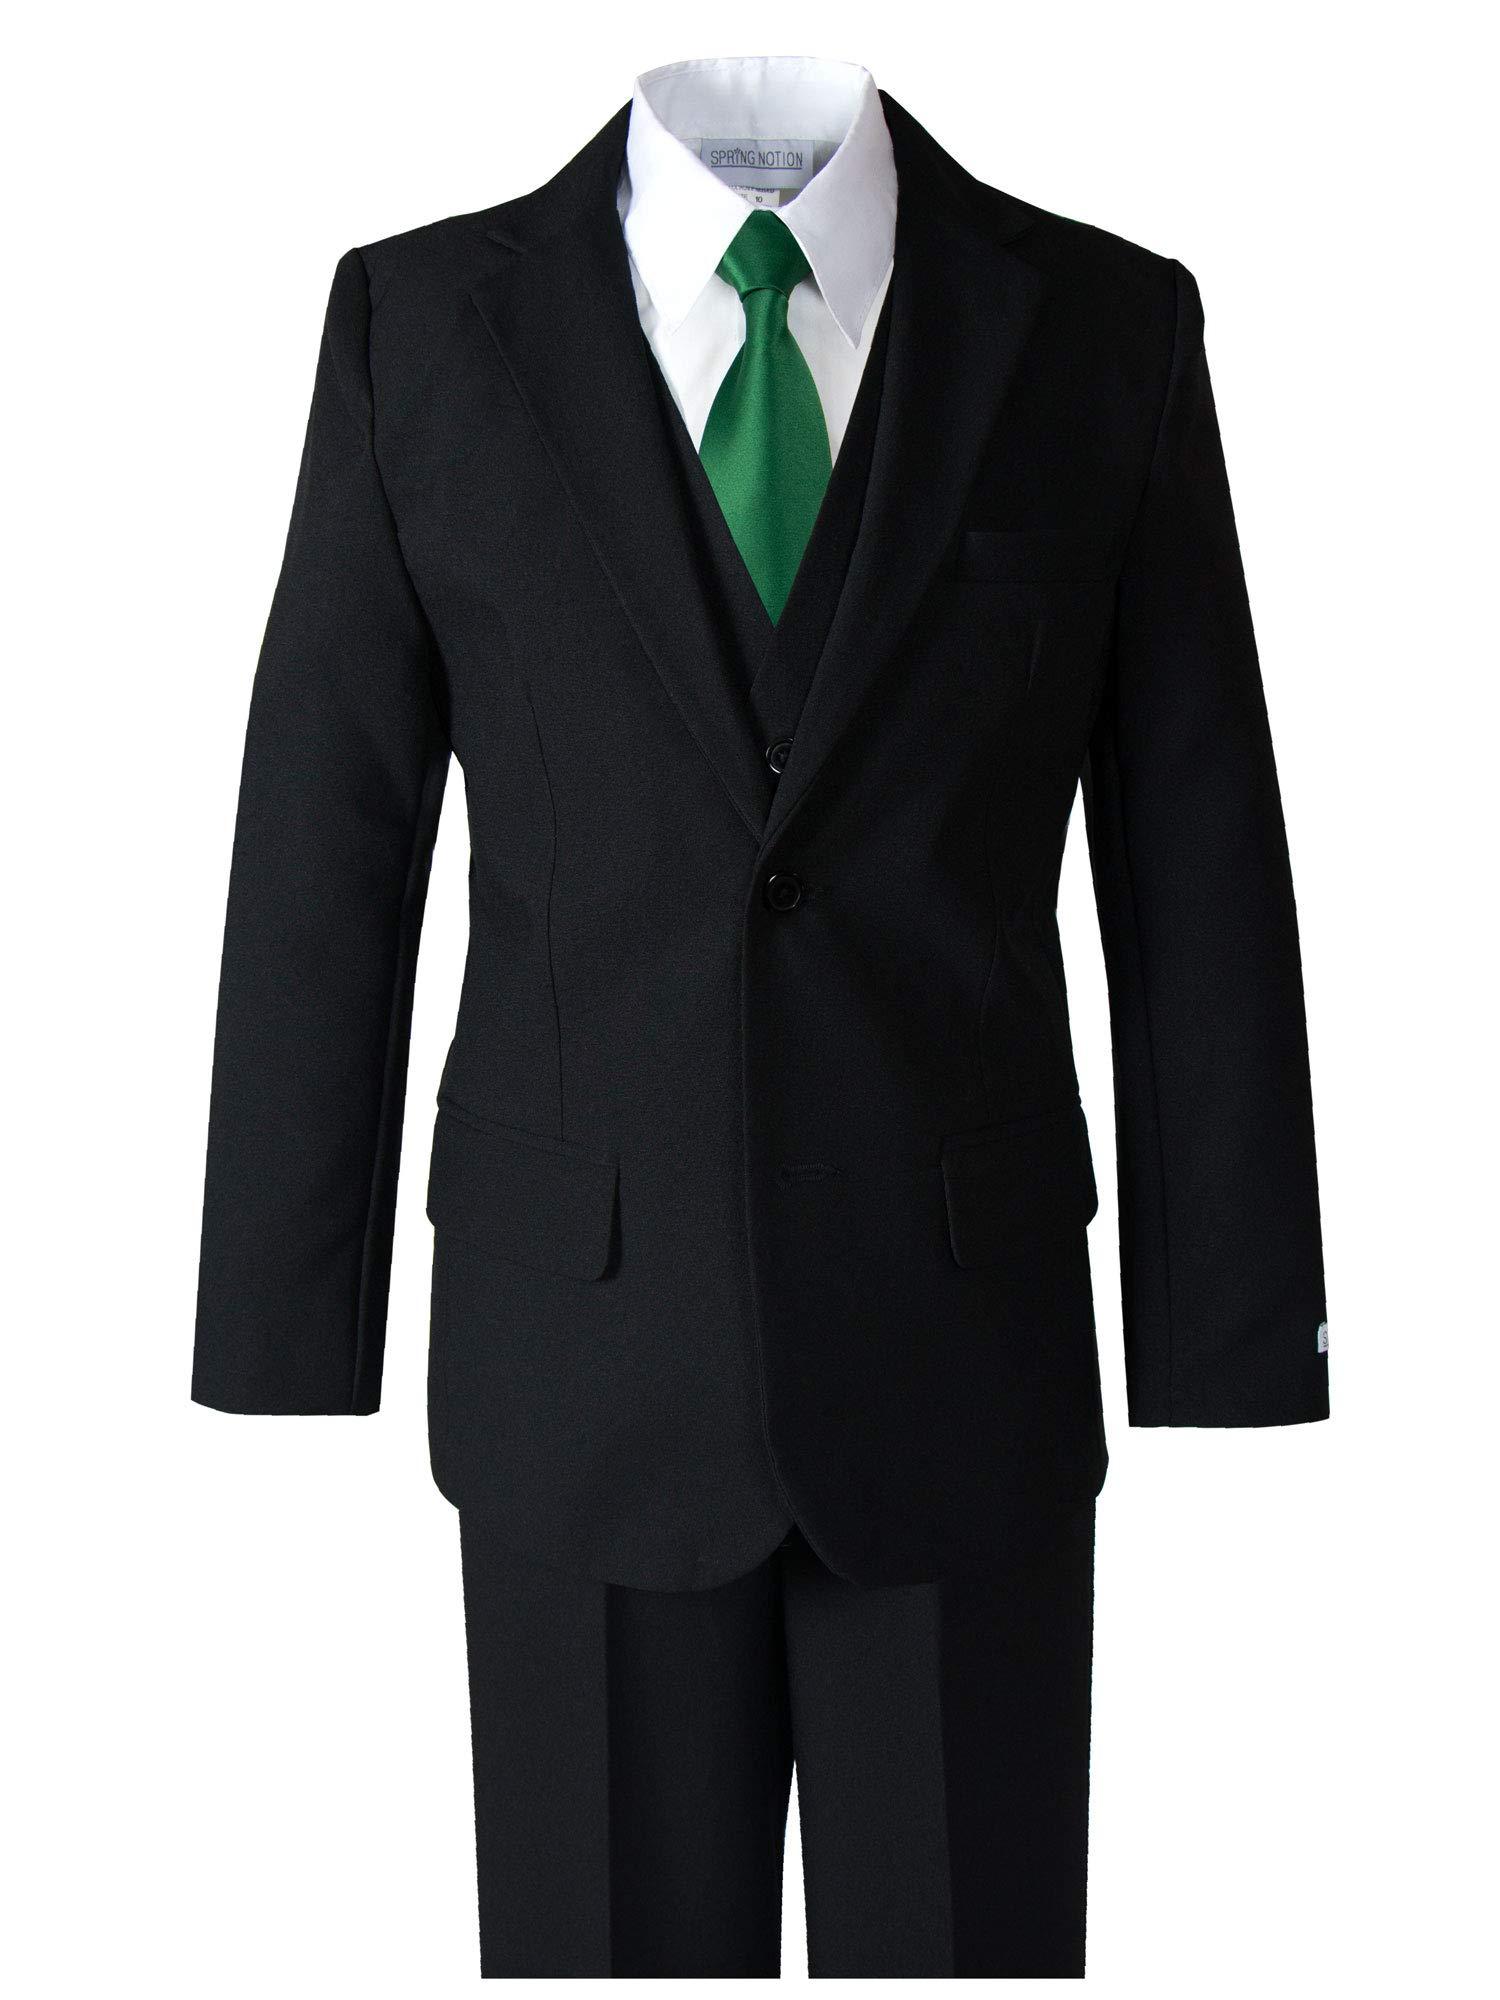 Spring Notion Big Boys' Modern Fit Dress Suit Set 8 Black w/Emerald Tie